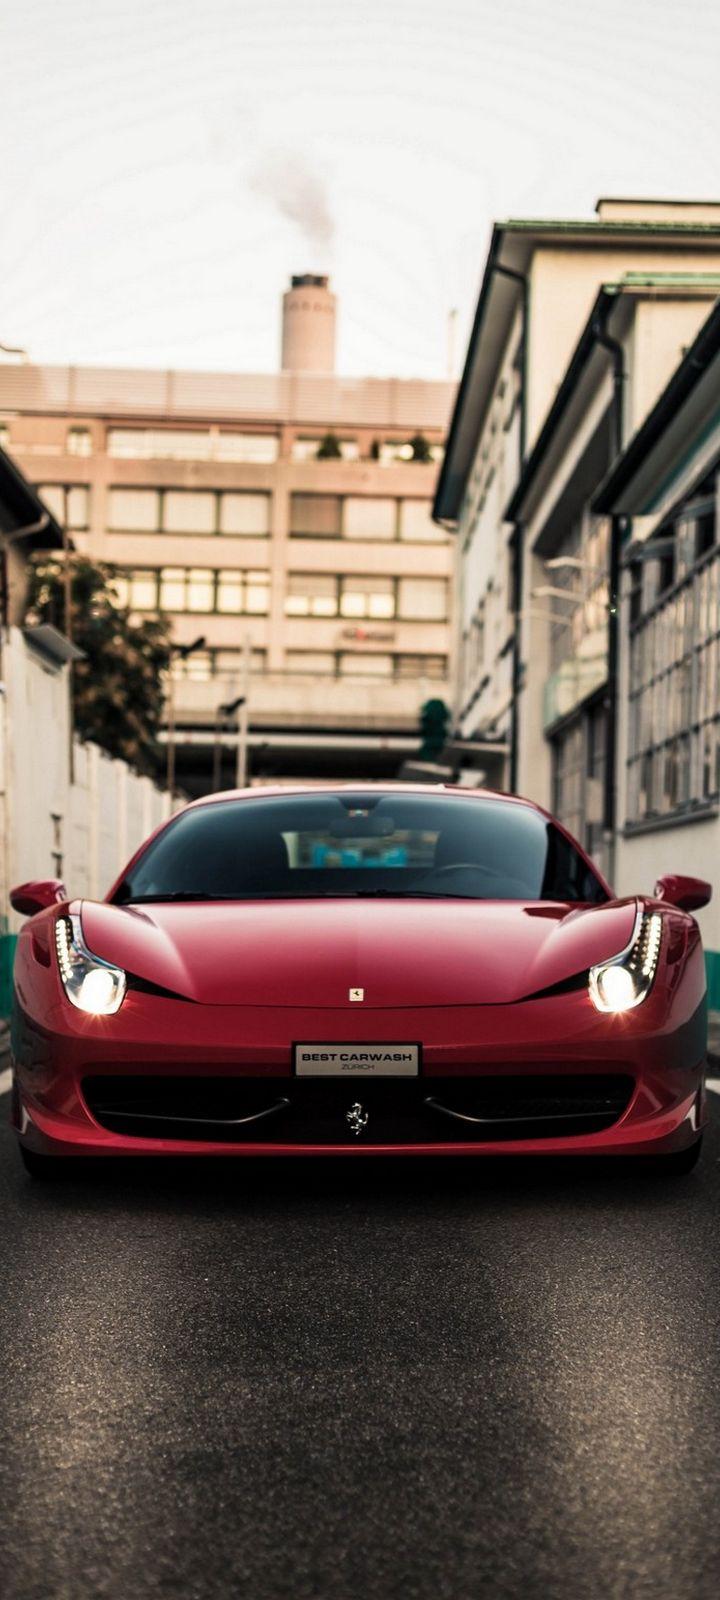 Front View Red Ferrari Car Wallpaper 720x1600